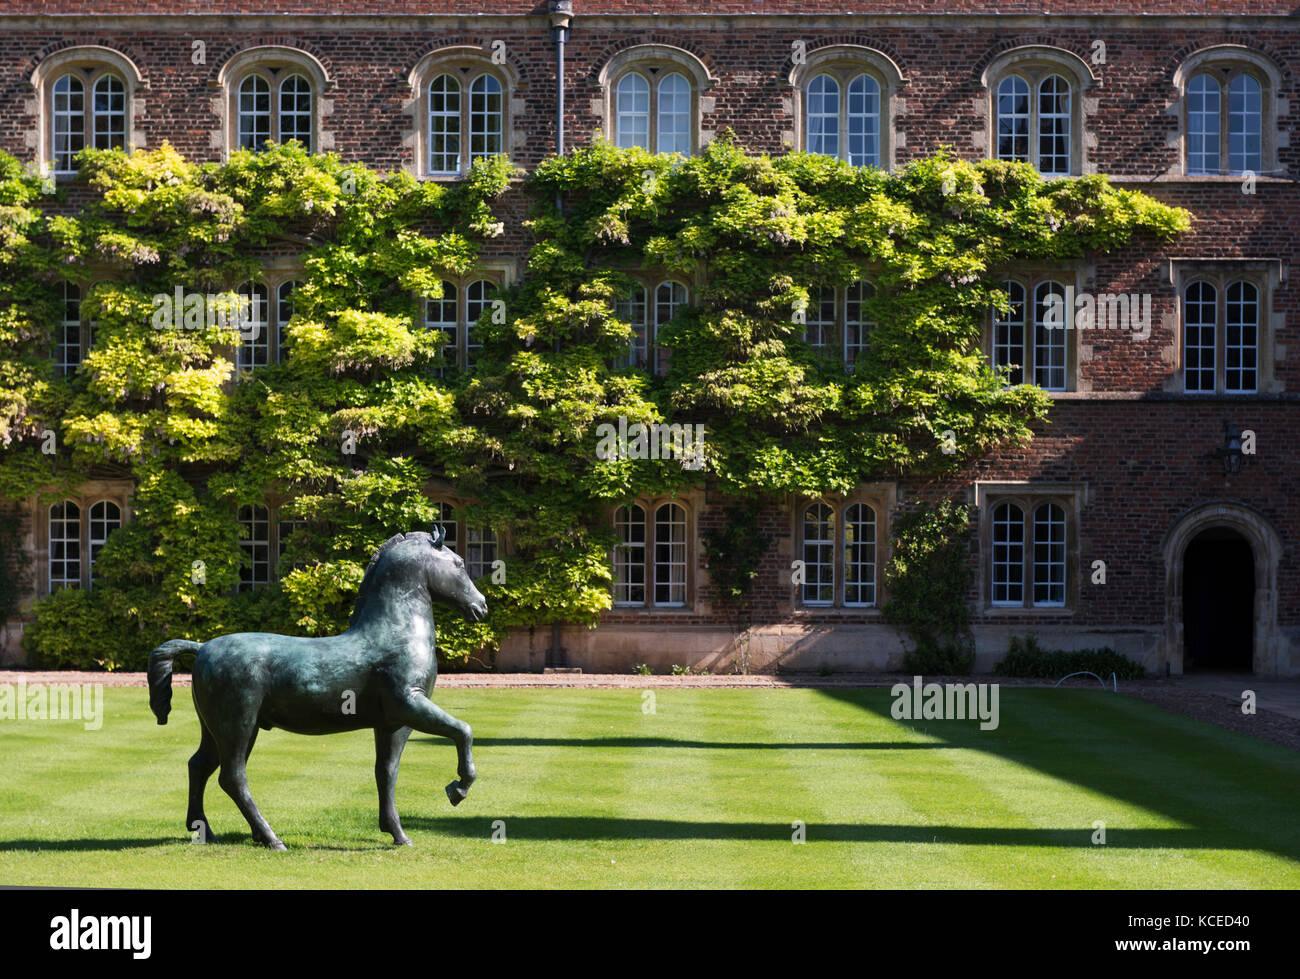 Jesus College, Jesus Lane, Cambridge, Cambridgeshire. First Court, Bronze Horse, 1983, by Barry Flanagan. Photographed - Stock Image